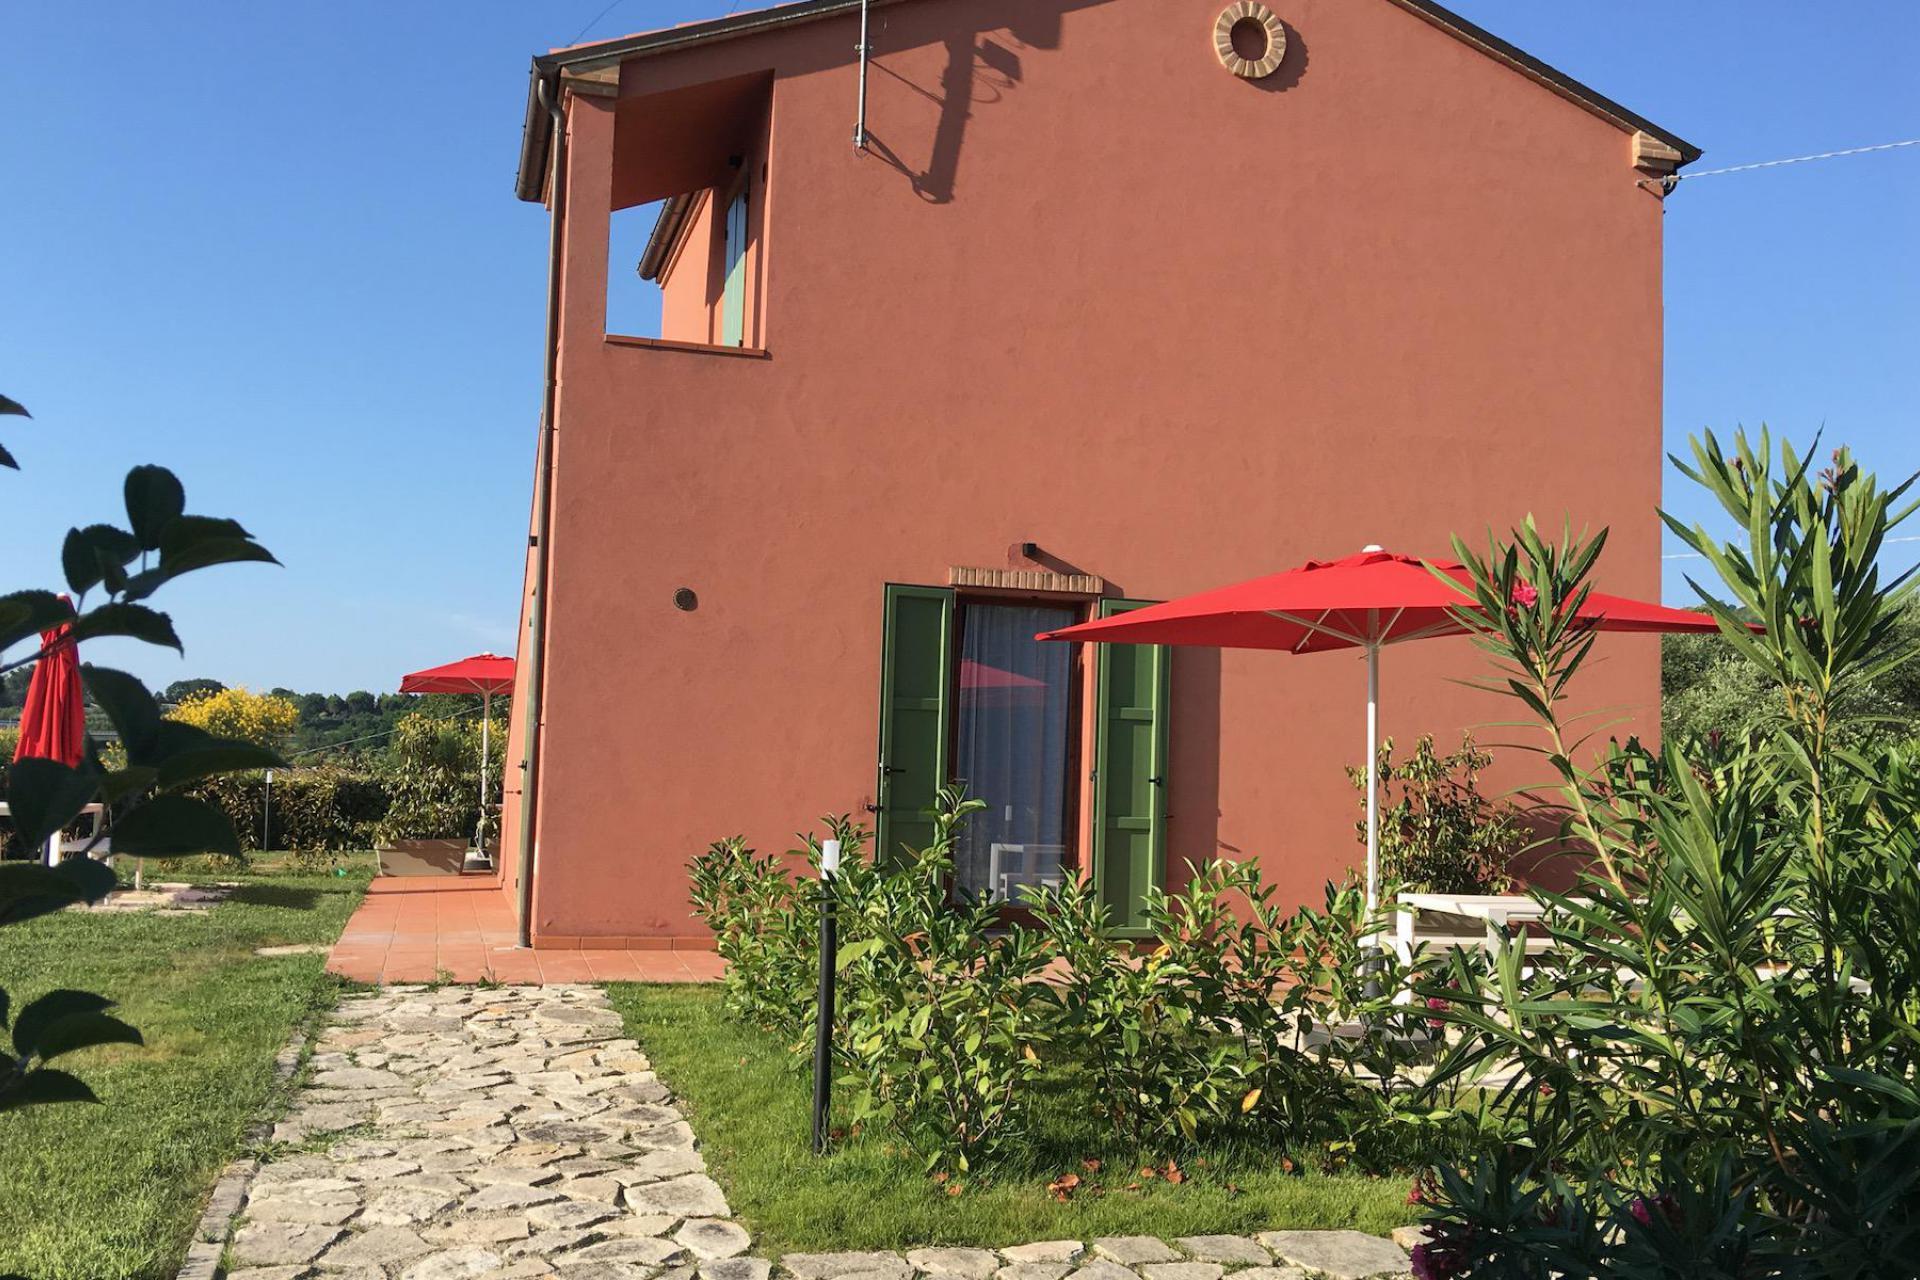 Agriturismo Le Marche Leuke agriturismo le Marche met restaurant in olijfgaard